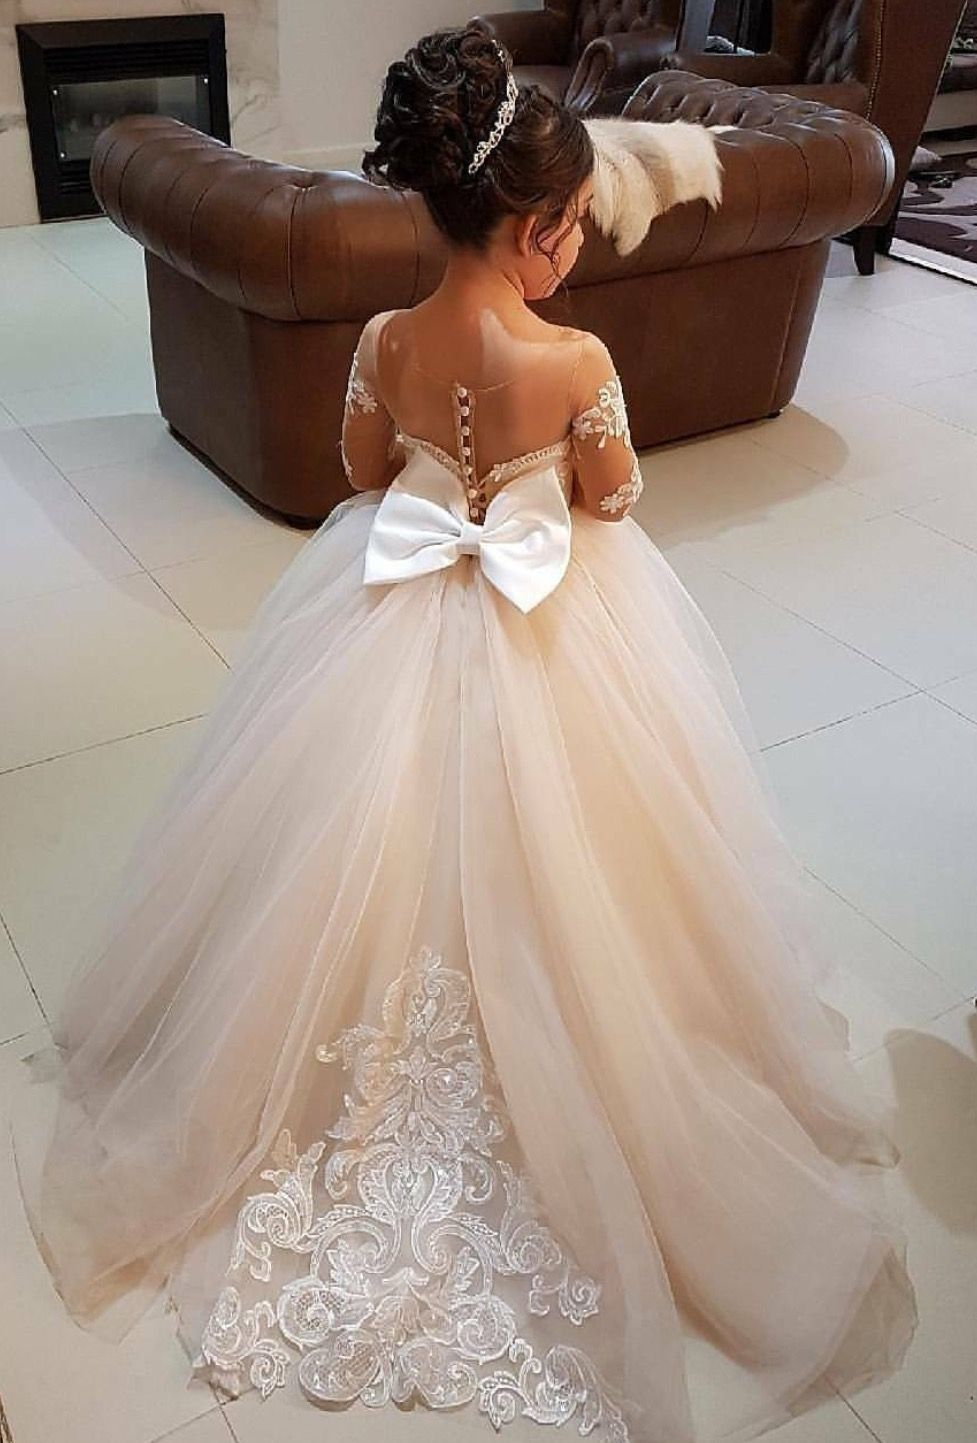 Baby dresses for wedding  Pin by Jennifer Cummer on My Winter wonderland wedding dress